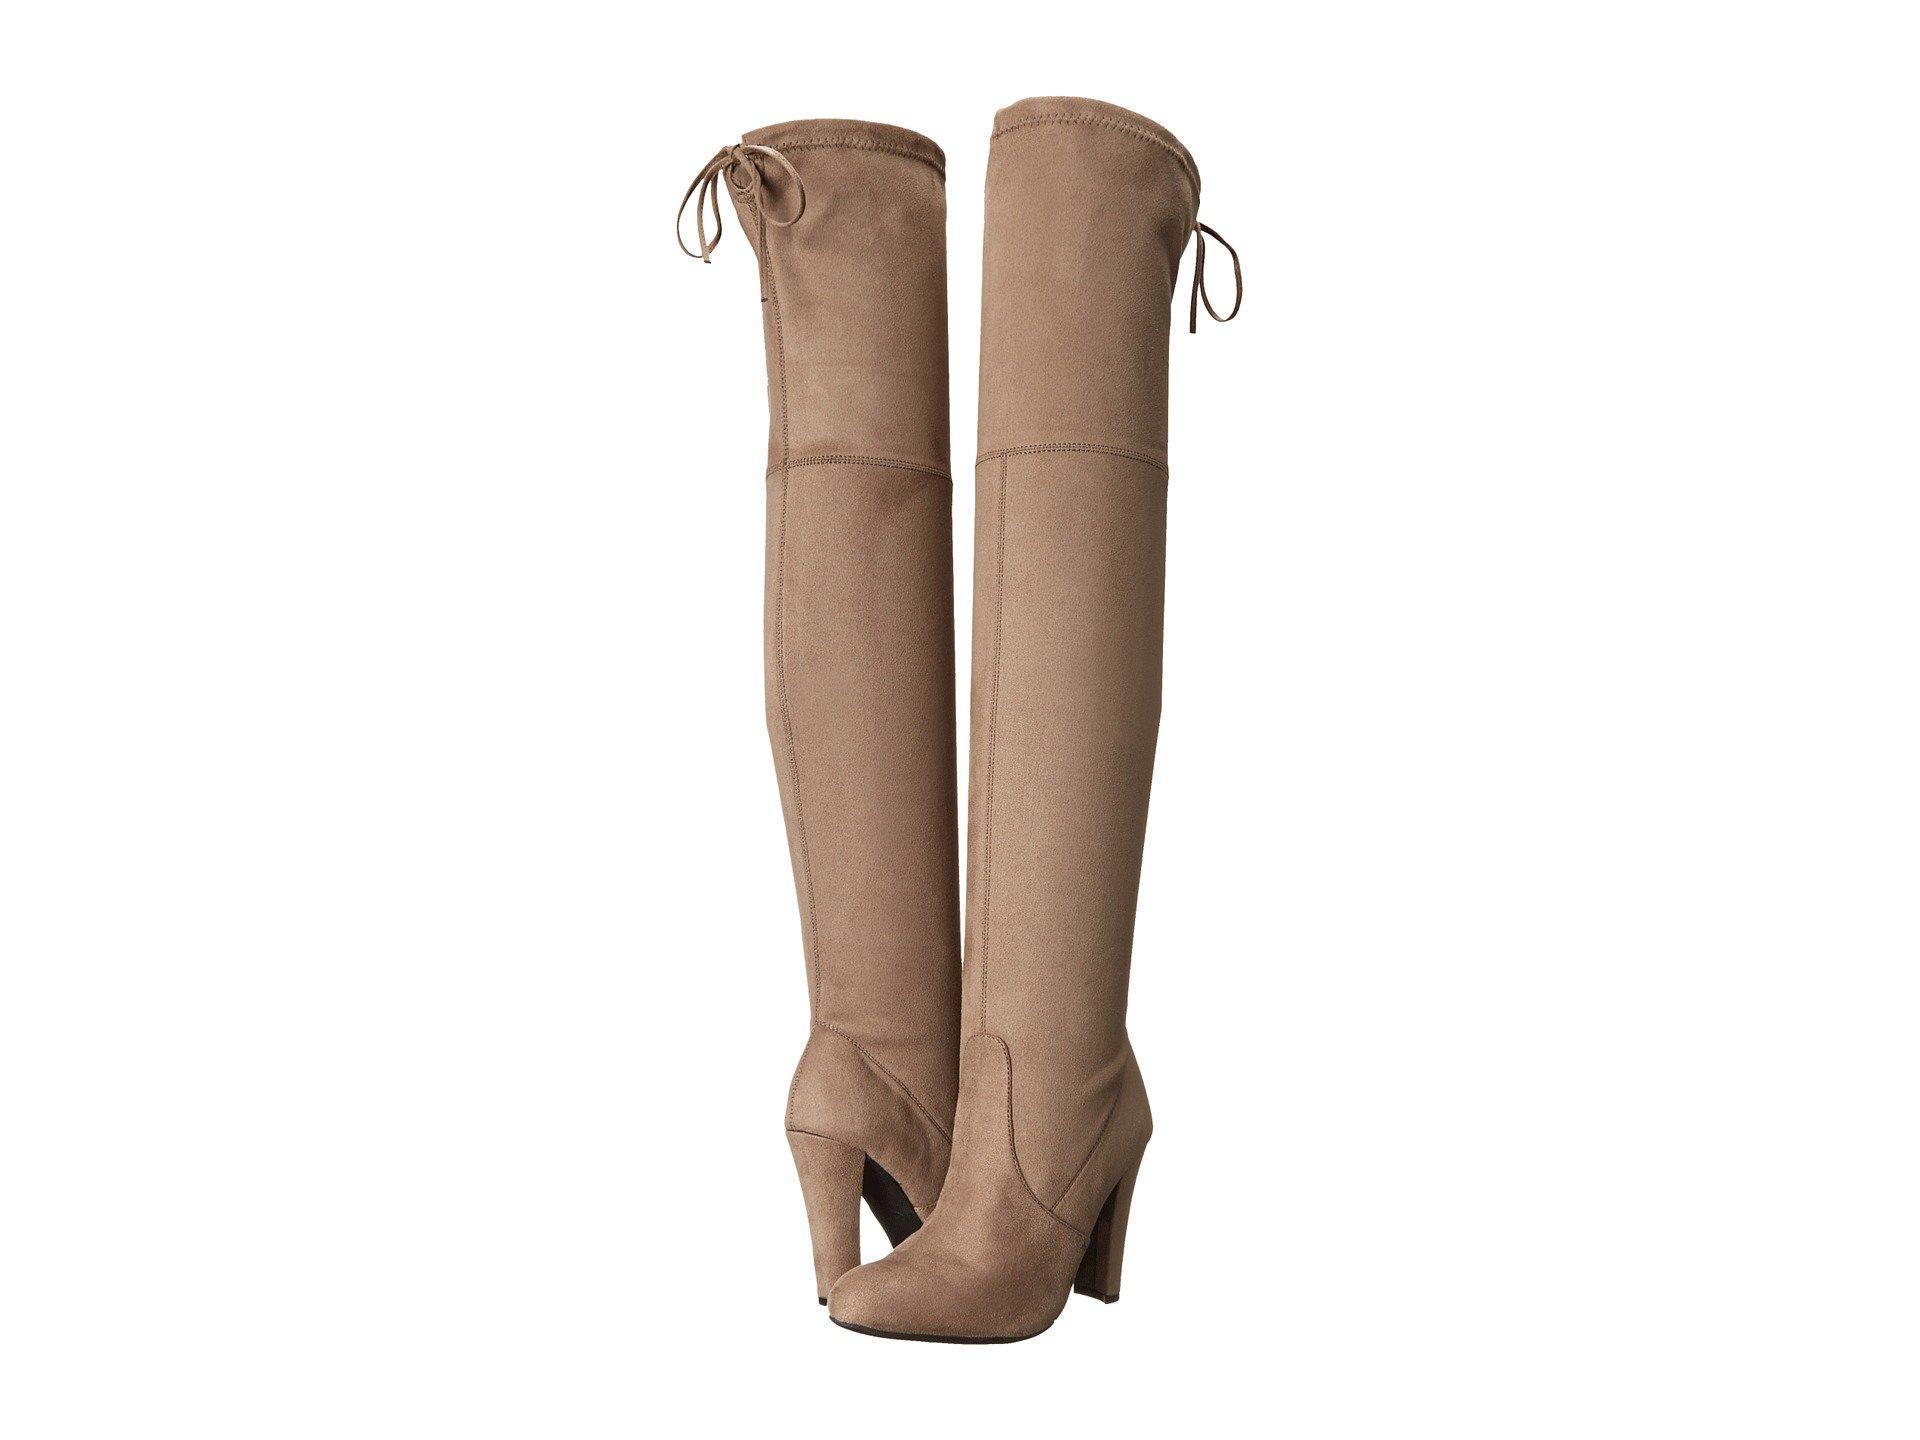 486732de192 Lyst - Steve Madden Gorgeous Knee Boot in Brown